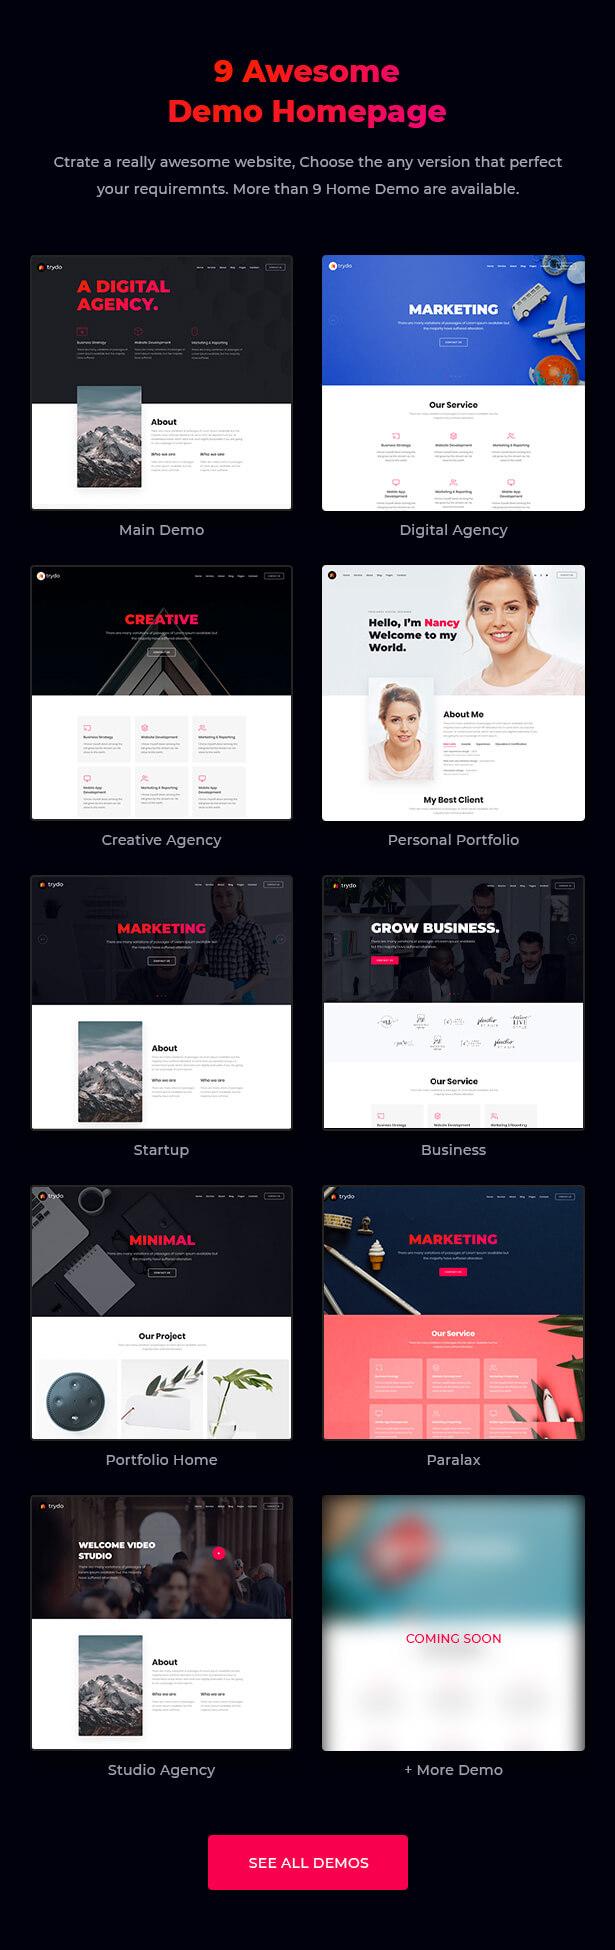 Trydo - React Creative Agency and React Portfolio Template - 7